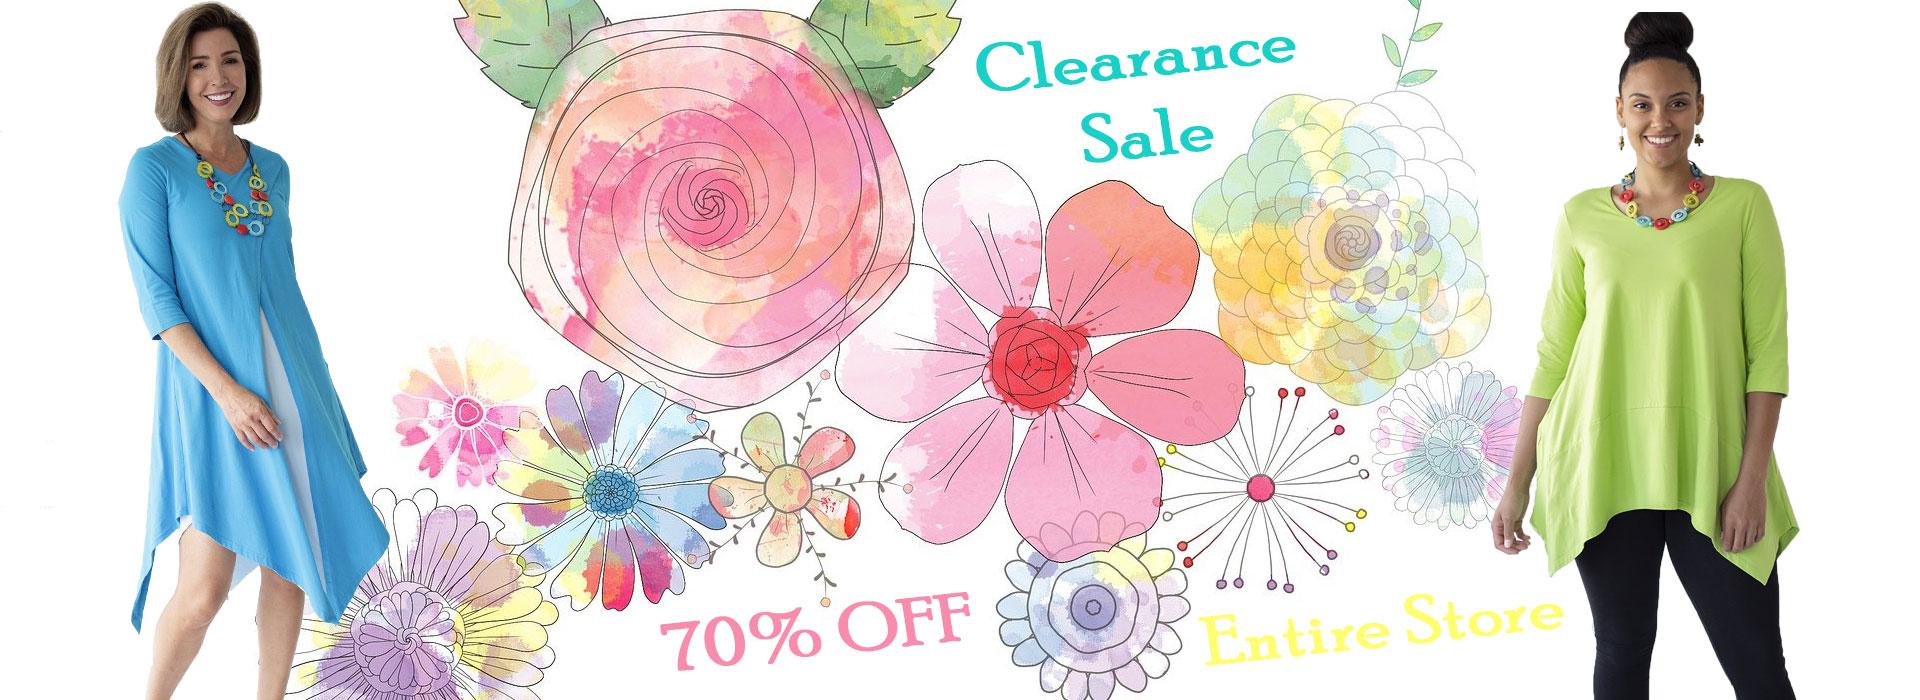 warehouse-sale-main-banner-flowers.jpg